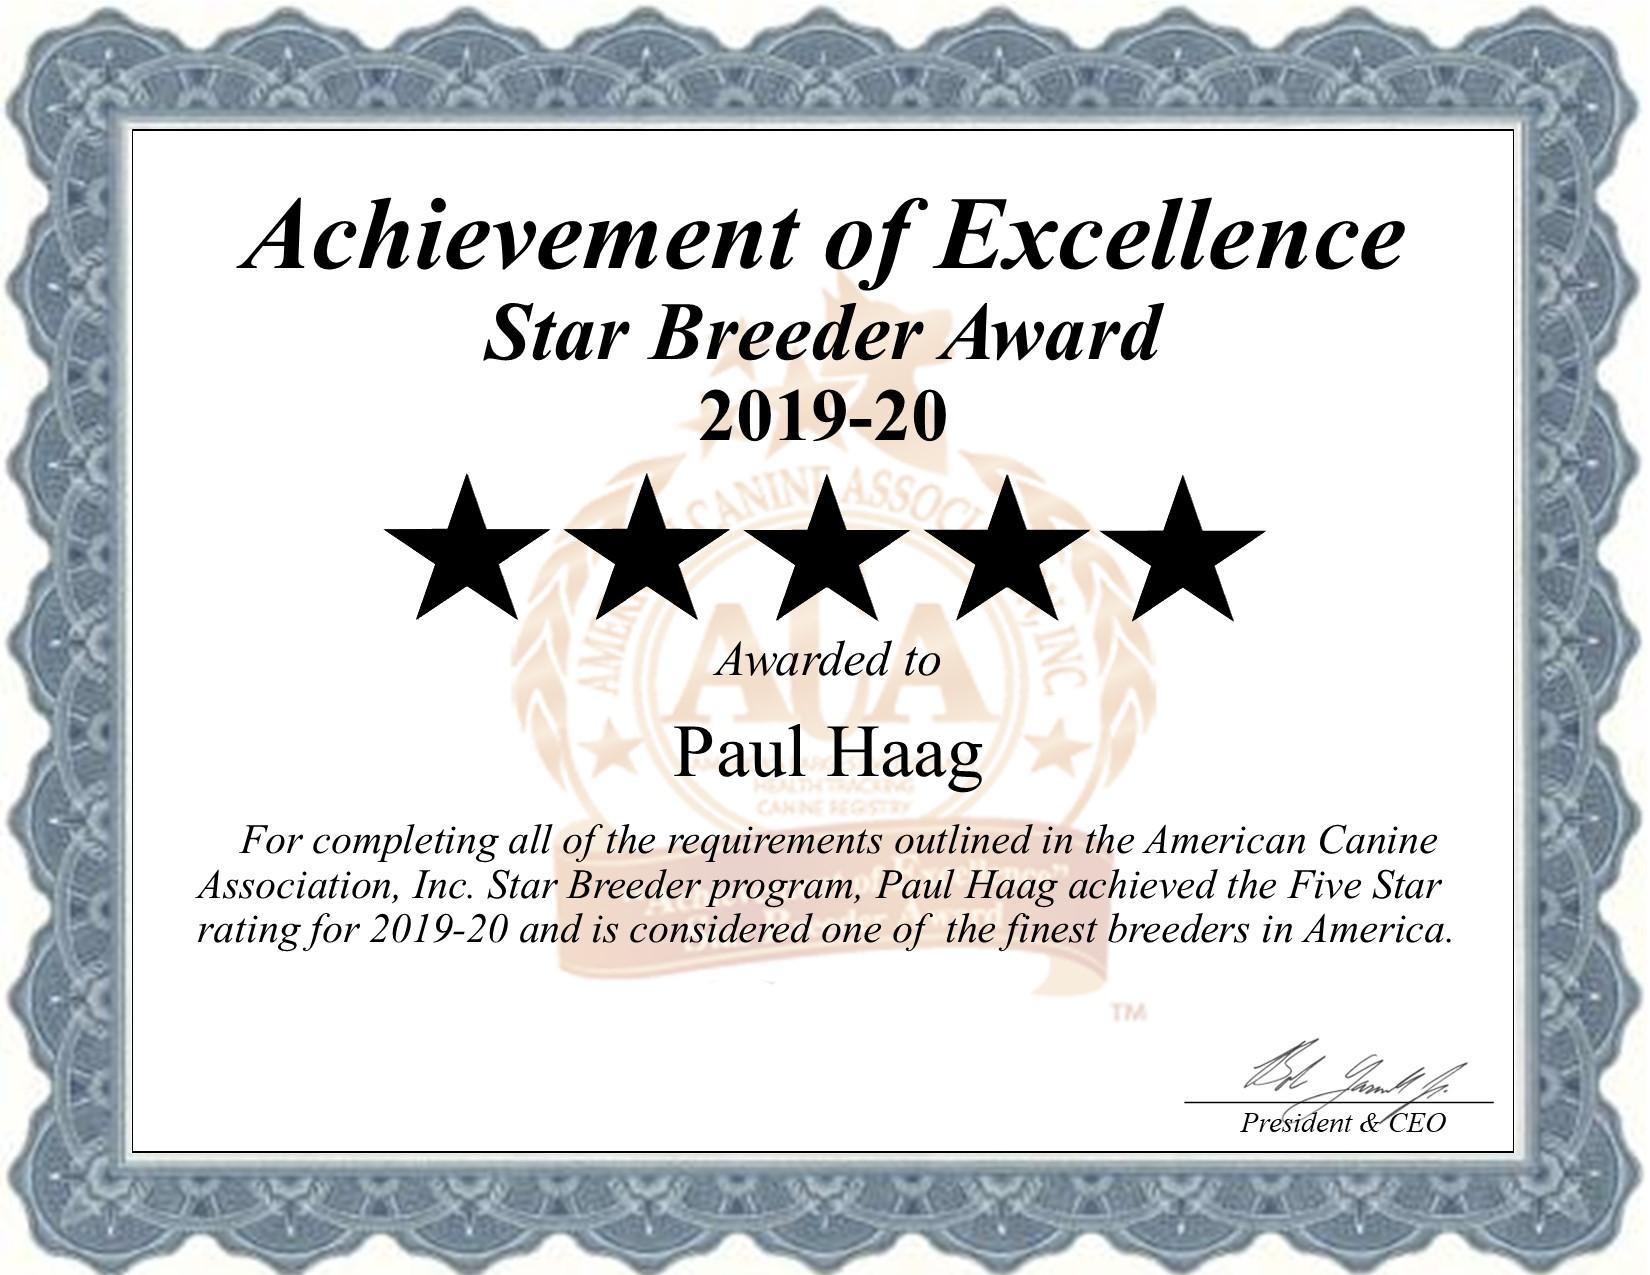 Paul, Haag, dog, breeder, star, certificate, Paul-Haag, eden, valley, MN, Minnesota, puppy, dog, kennels, mill, puppymill, usda, 5-star, ACA, ICA, registered, show handler, yorkie, MNPBA, puppies